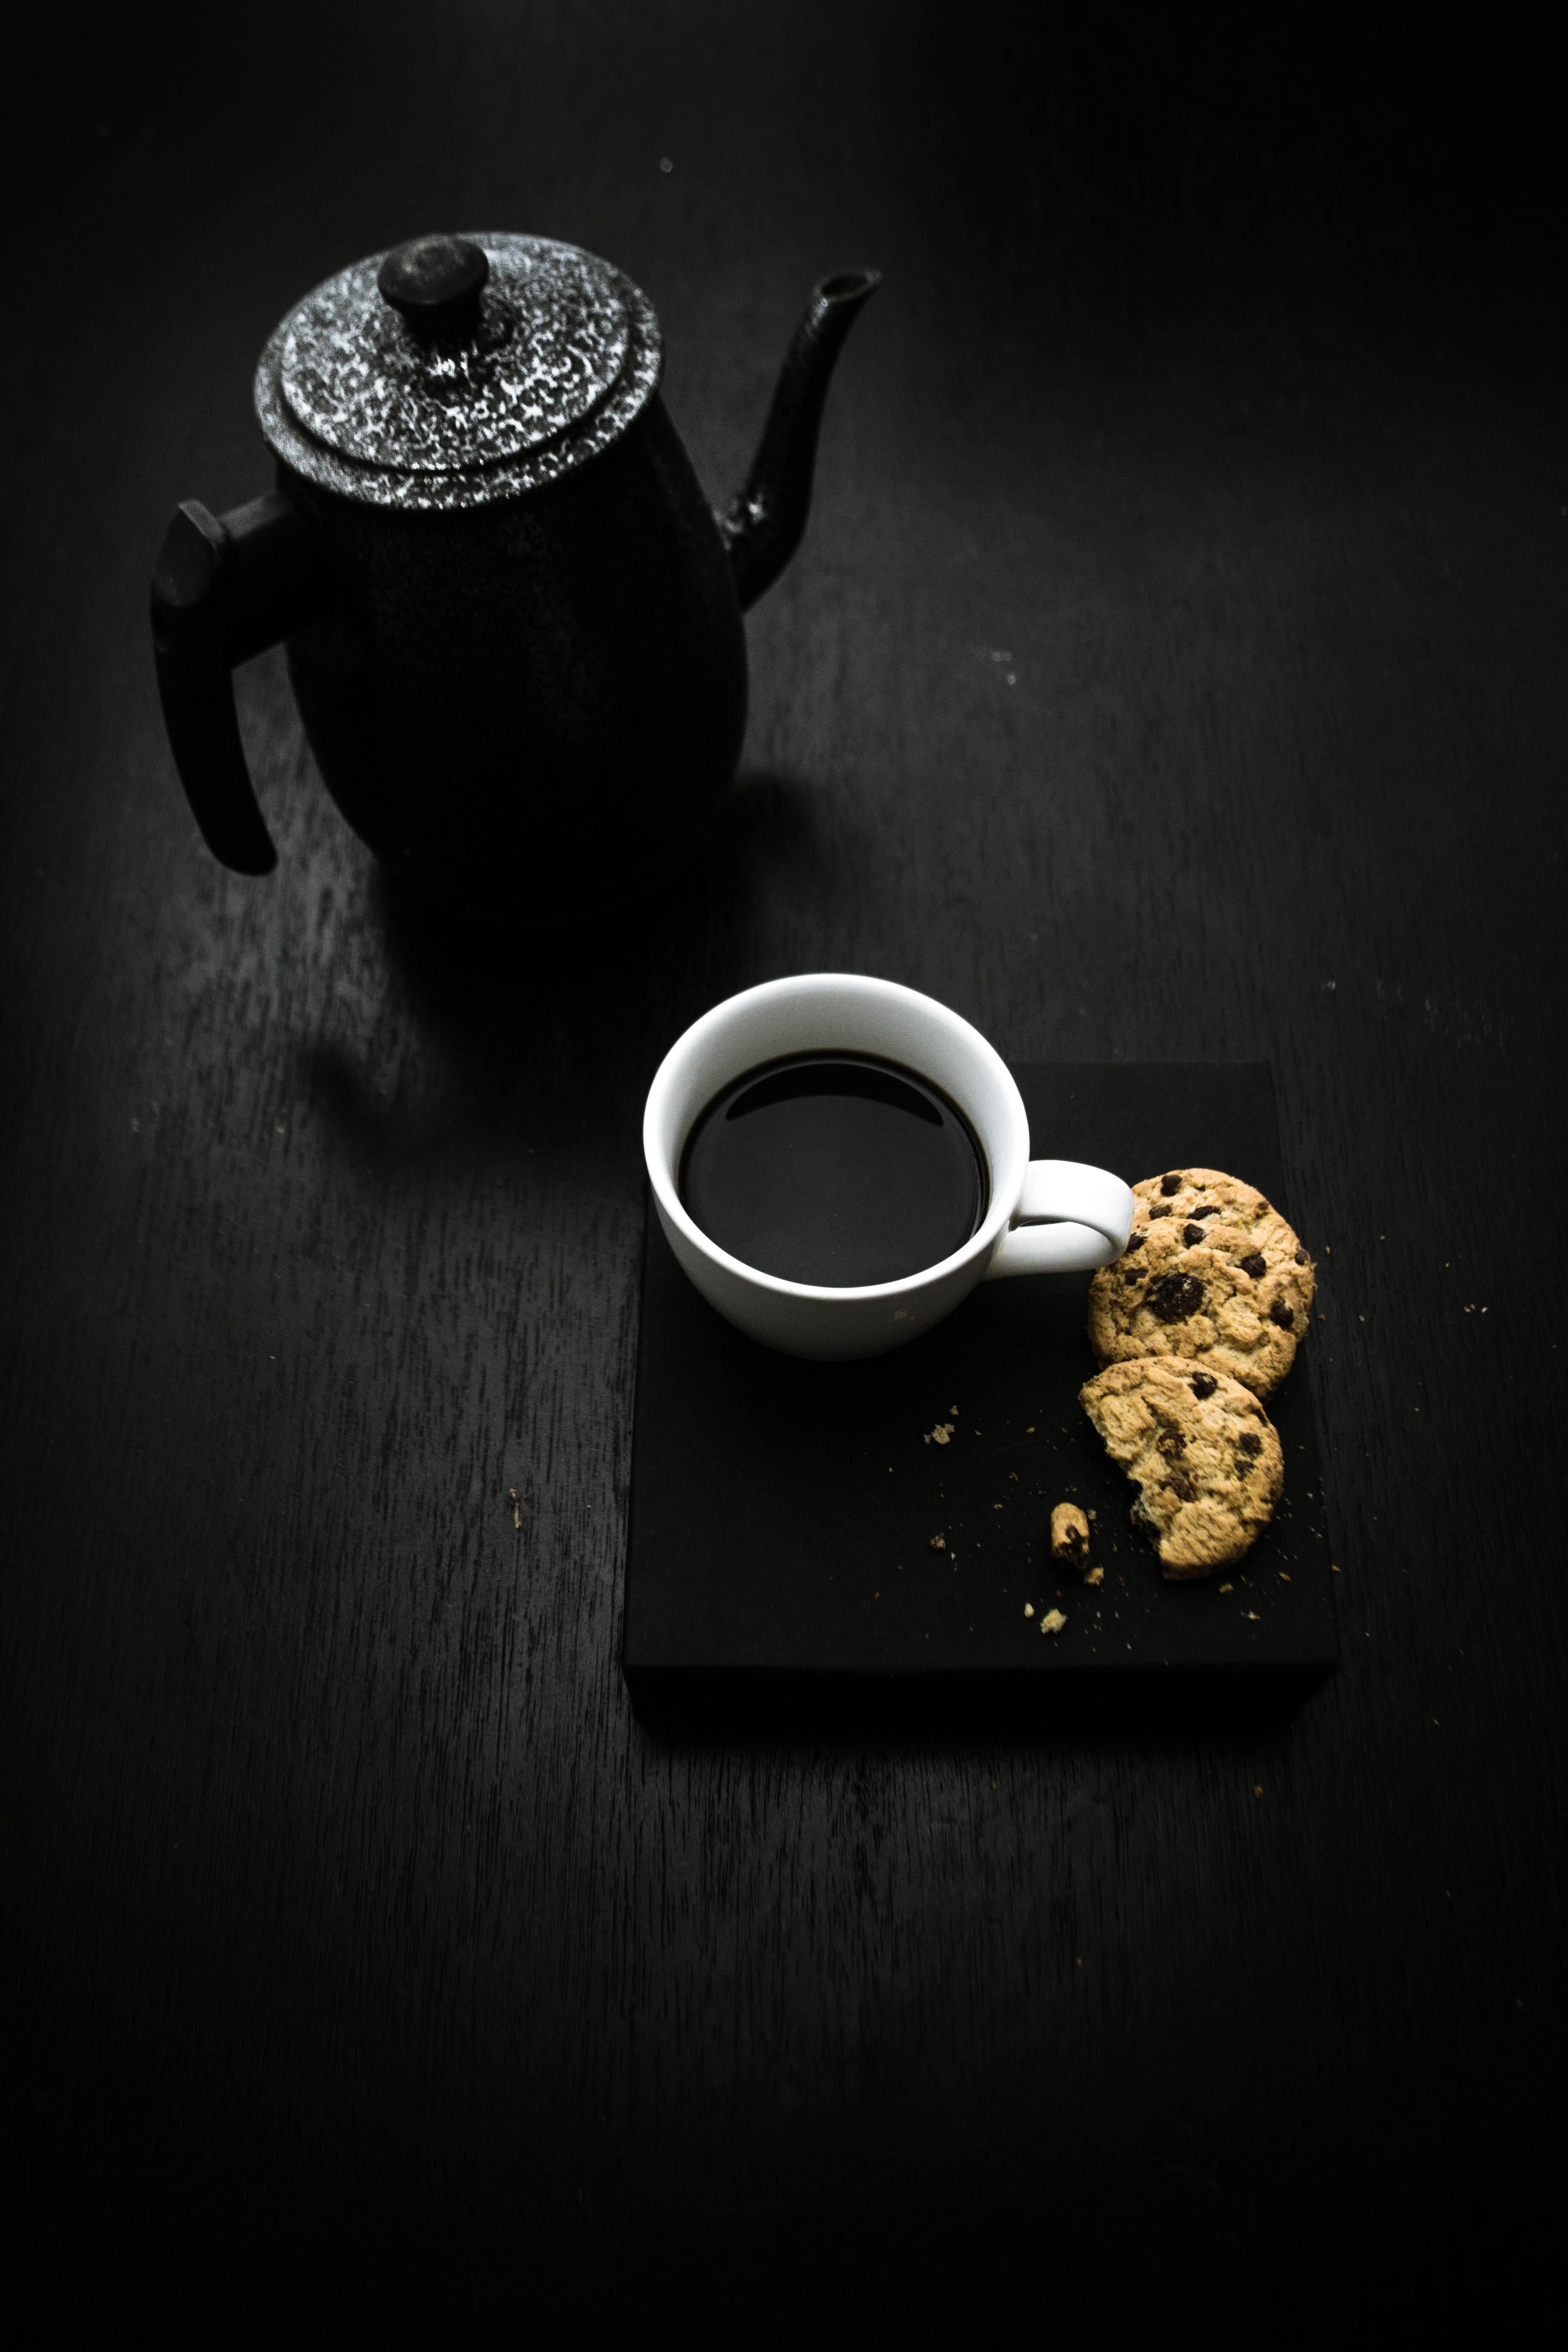 Black Teapot Beside Teacup